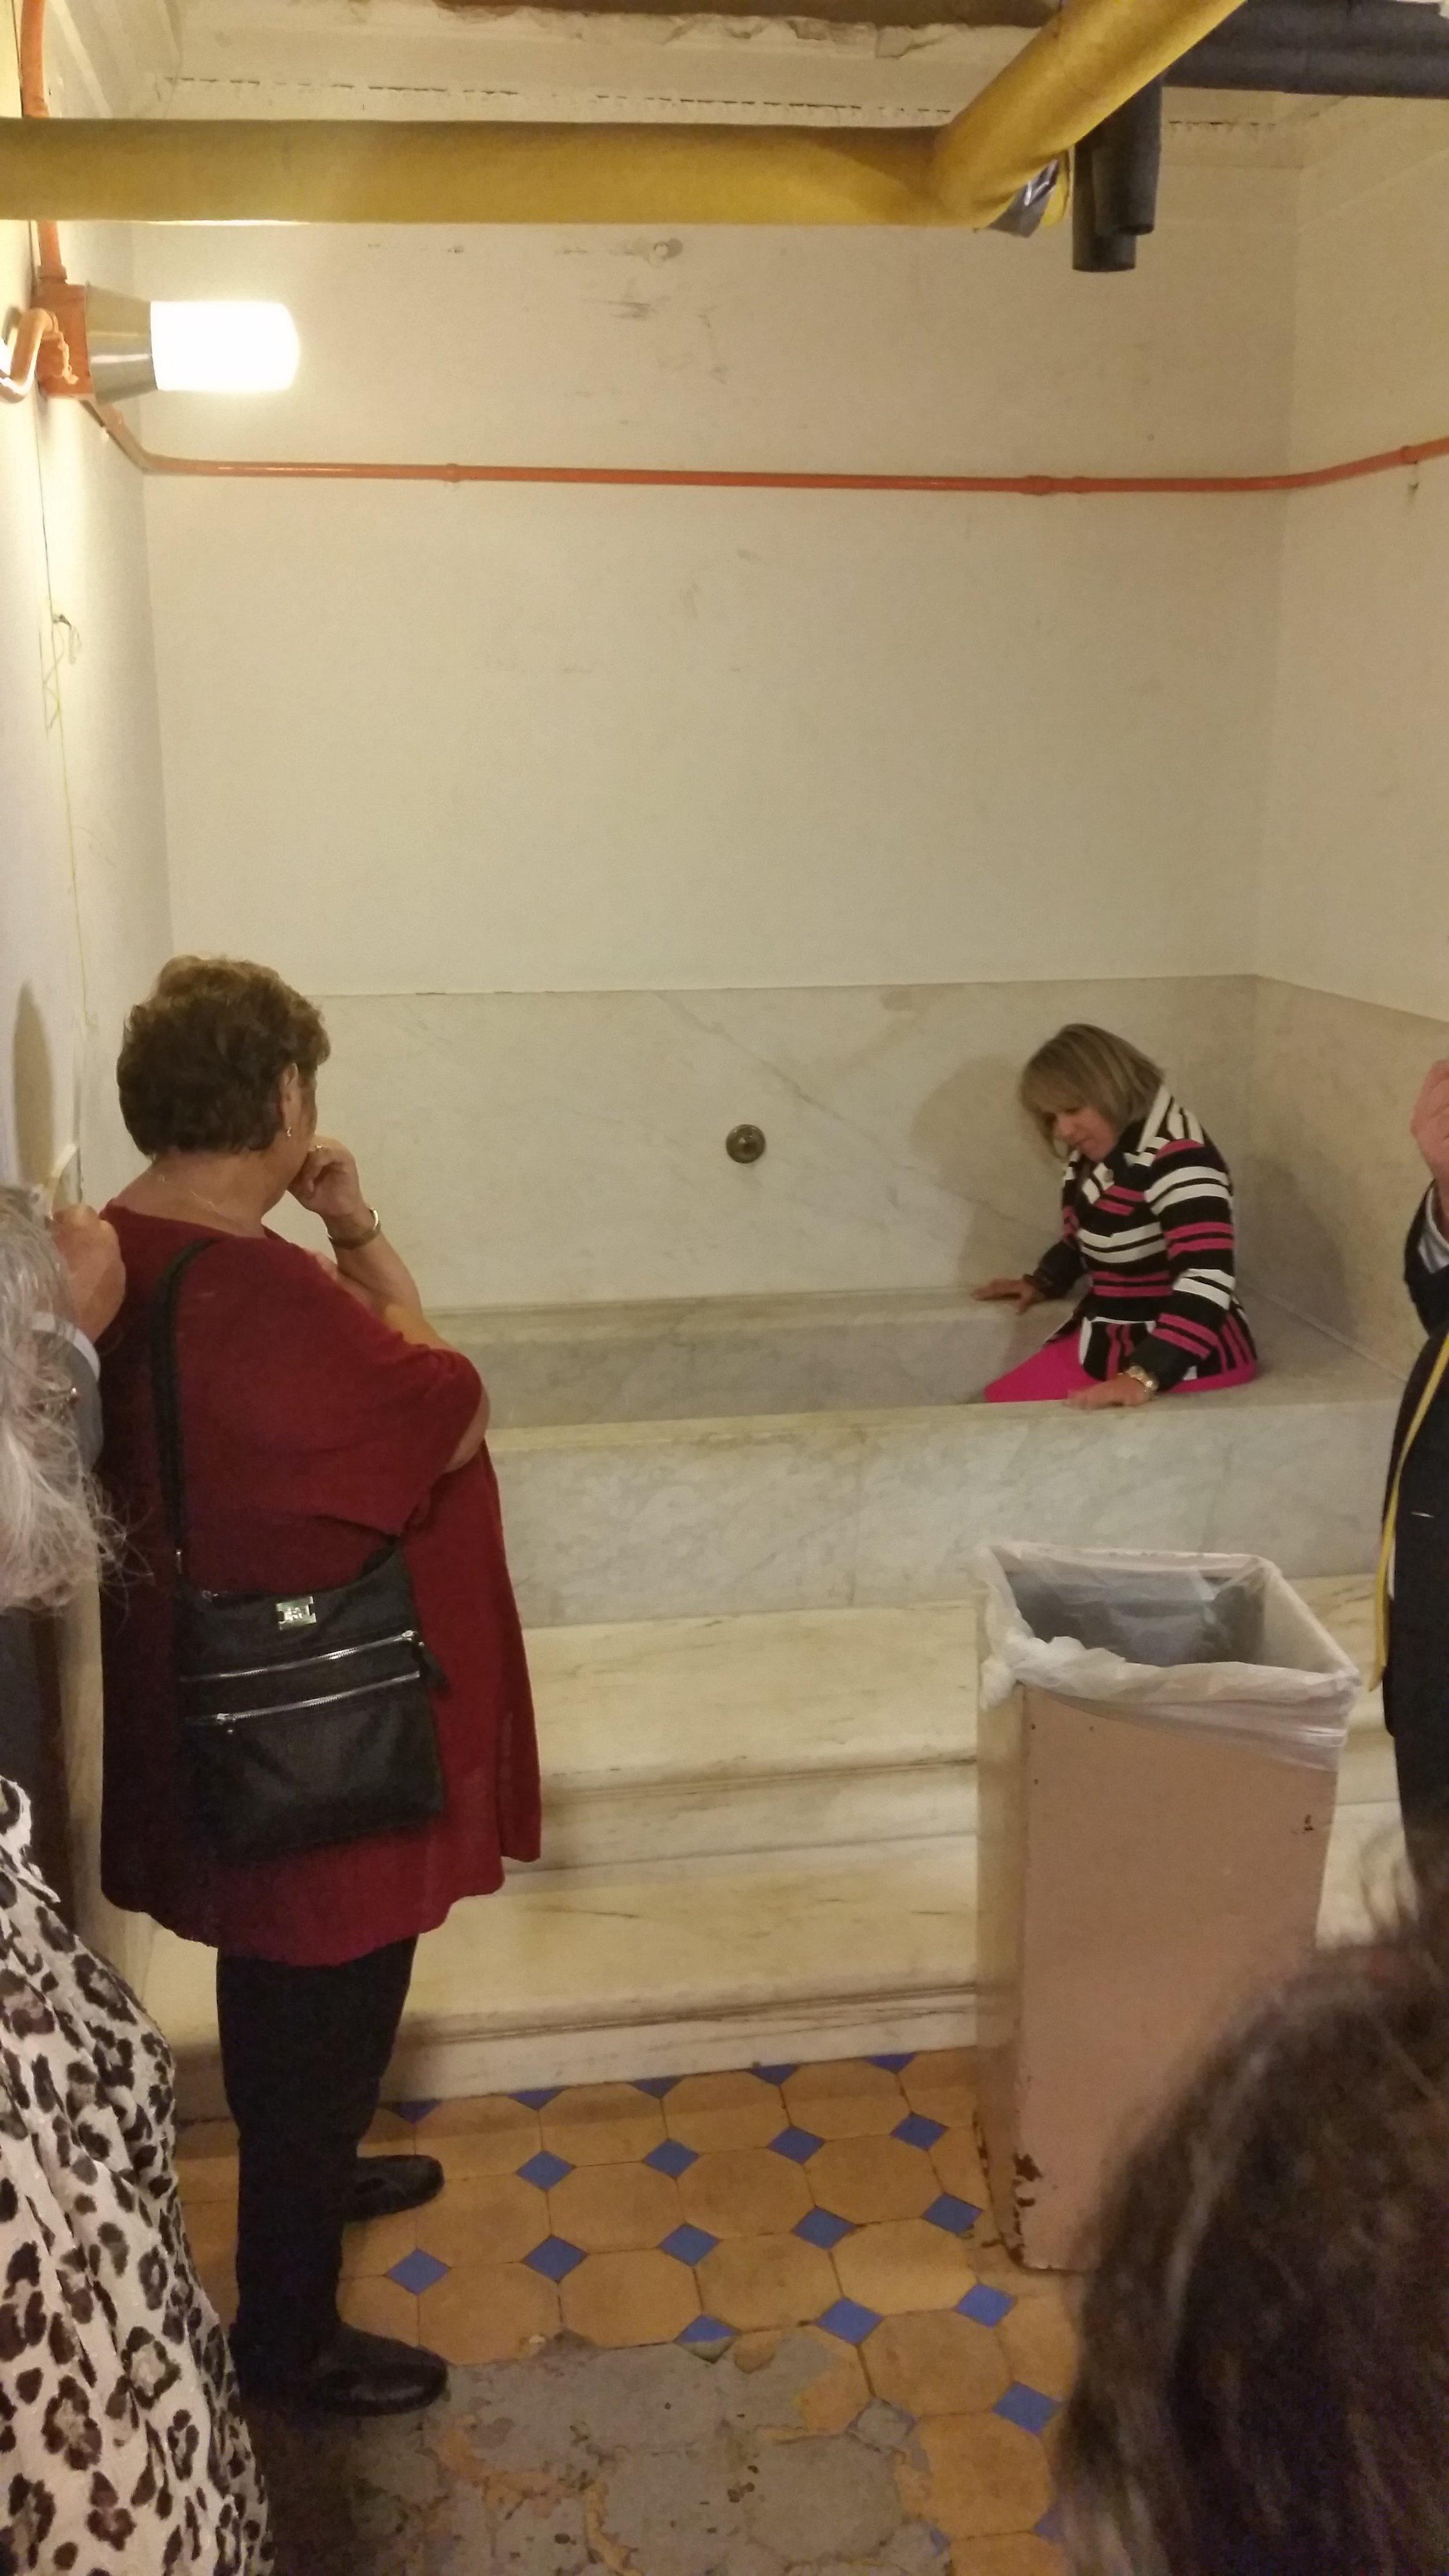 Historic bathtub in the basement of US Capital